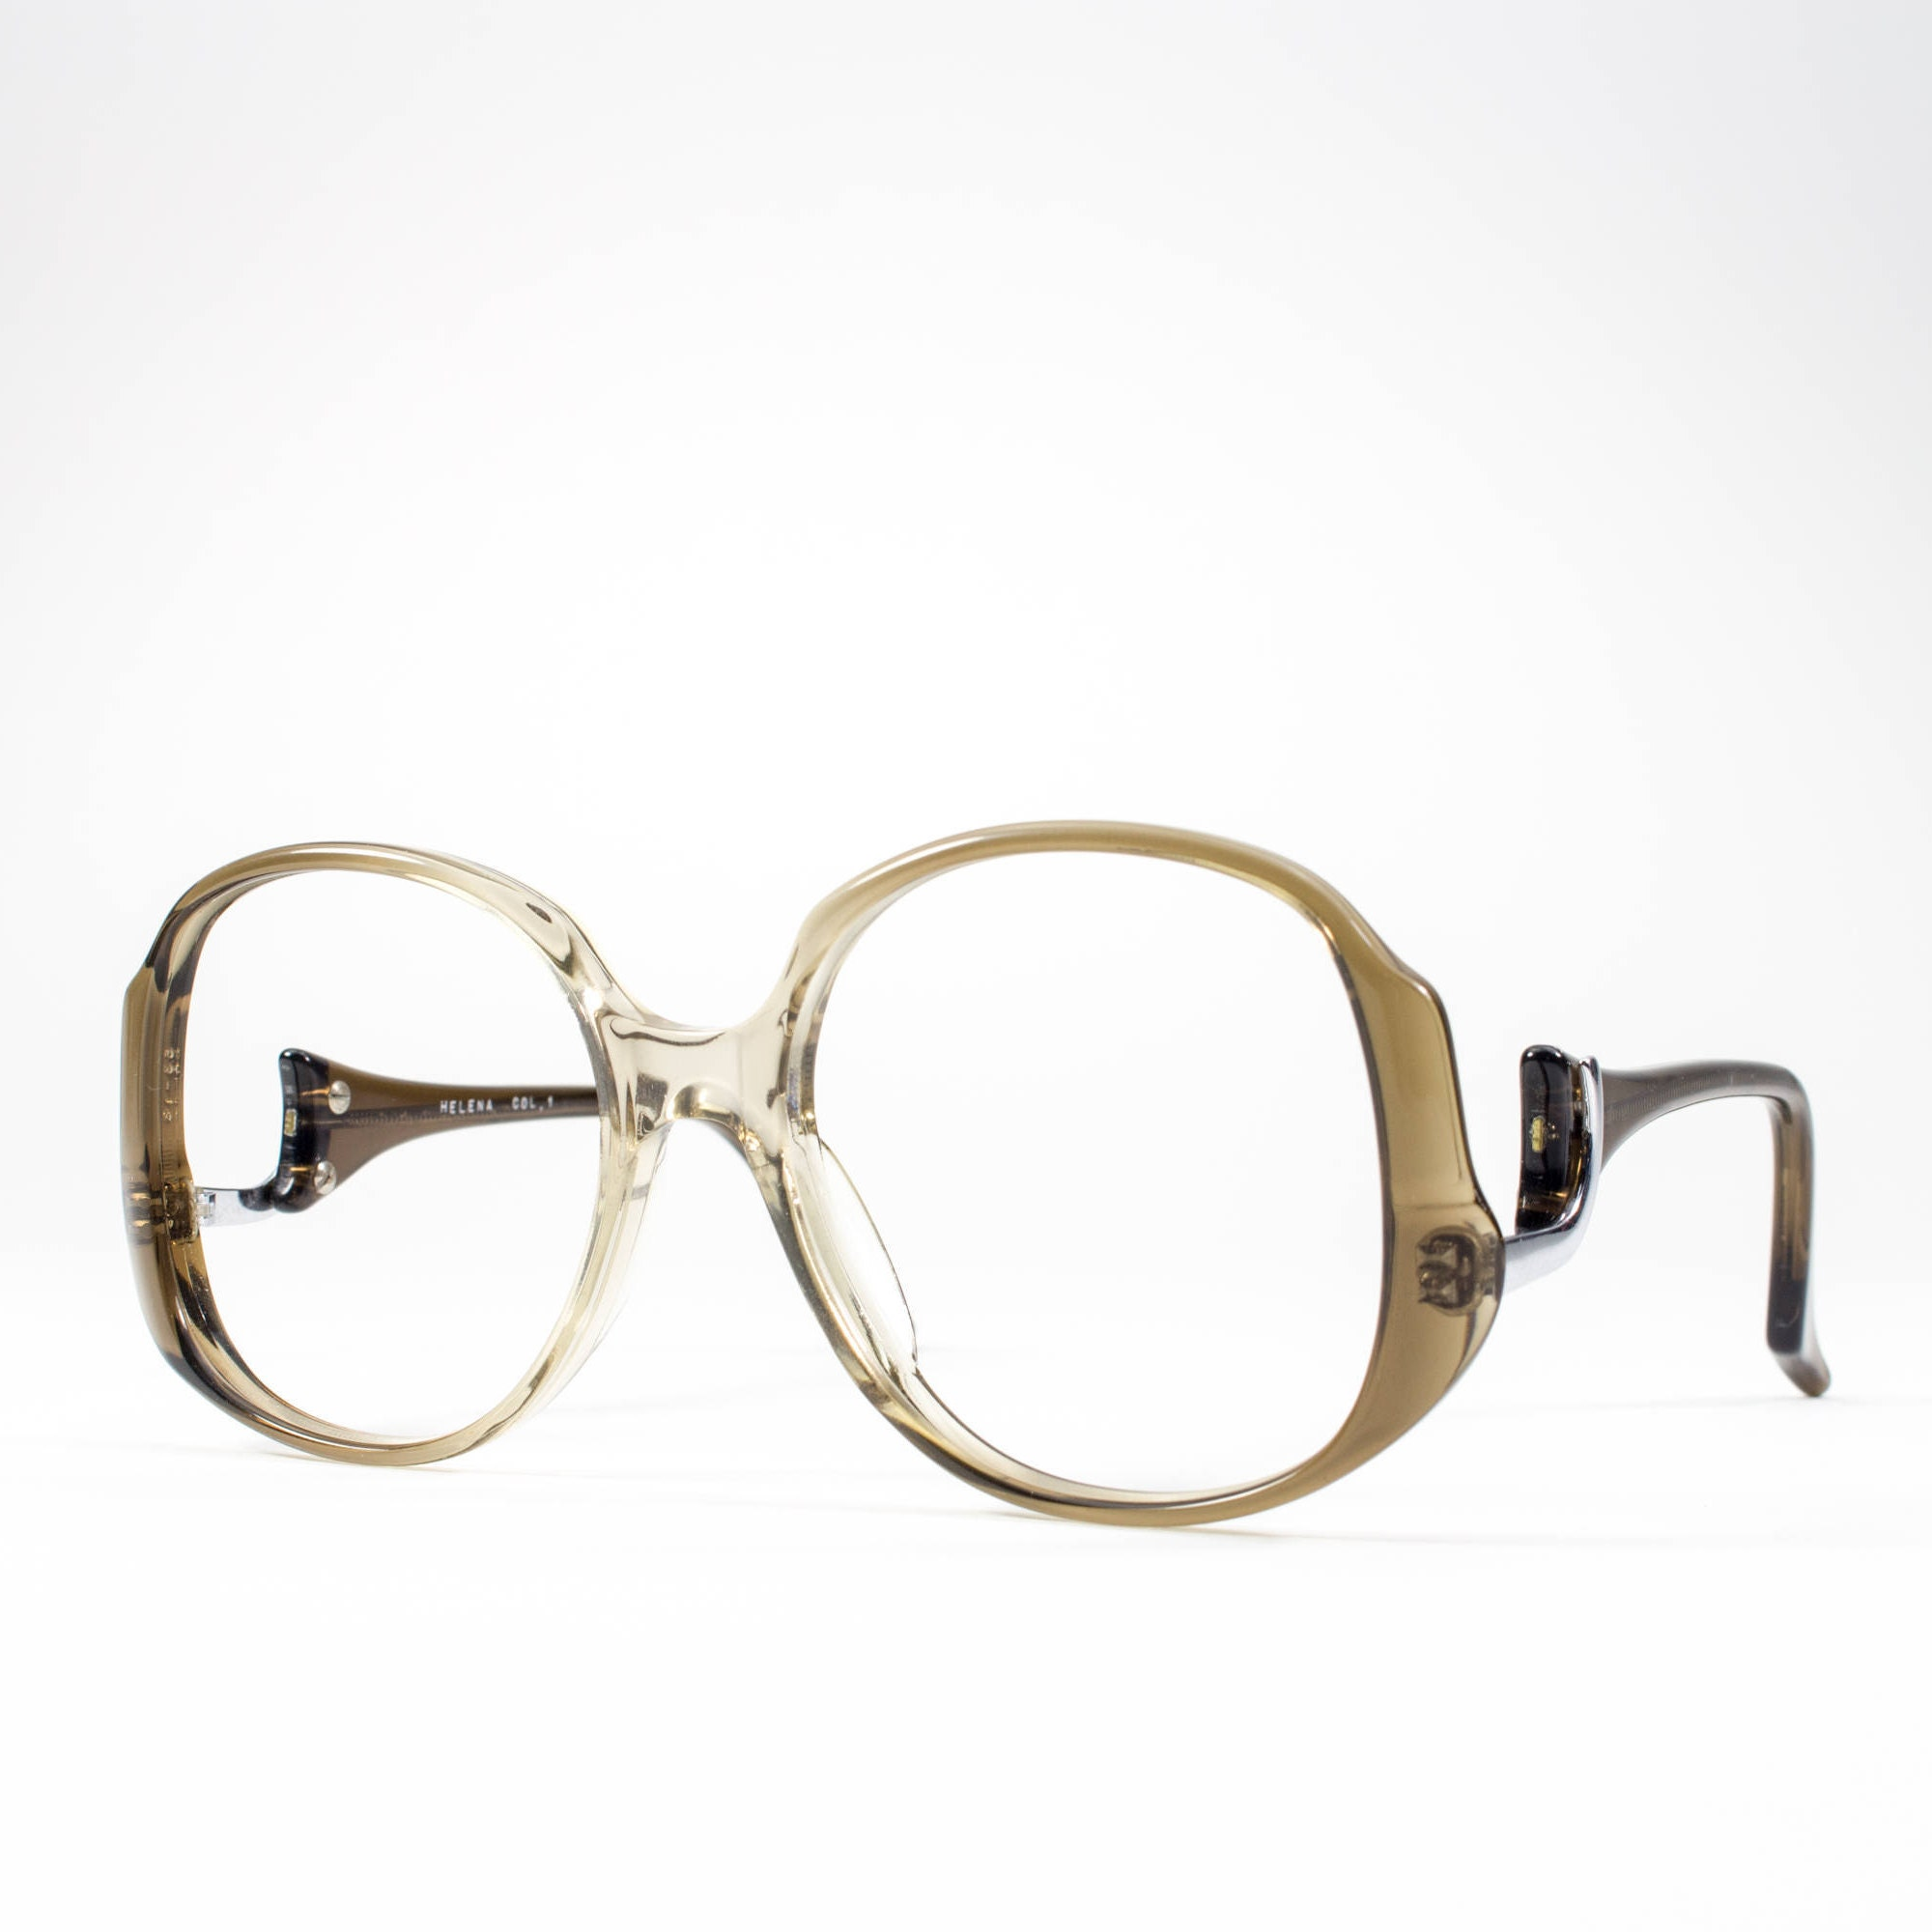 86a0197856 ... Vintage Eyeglasses